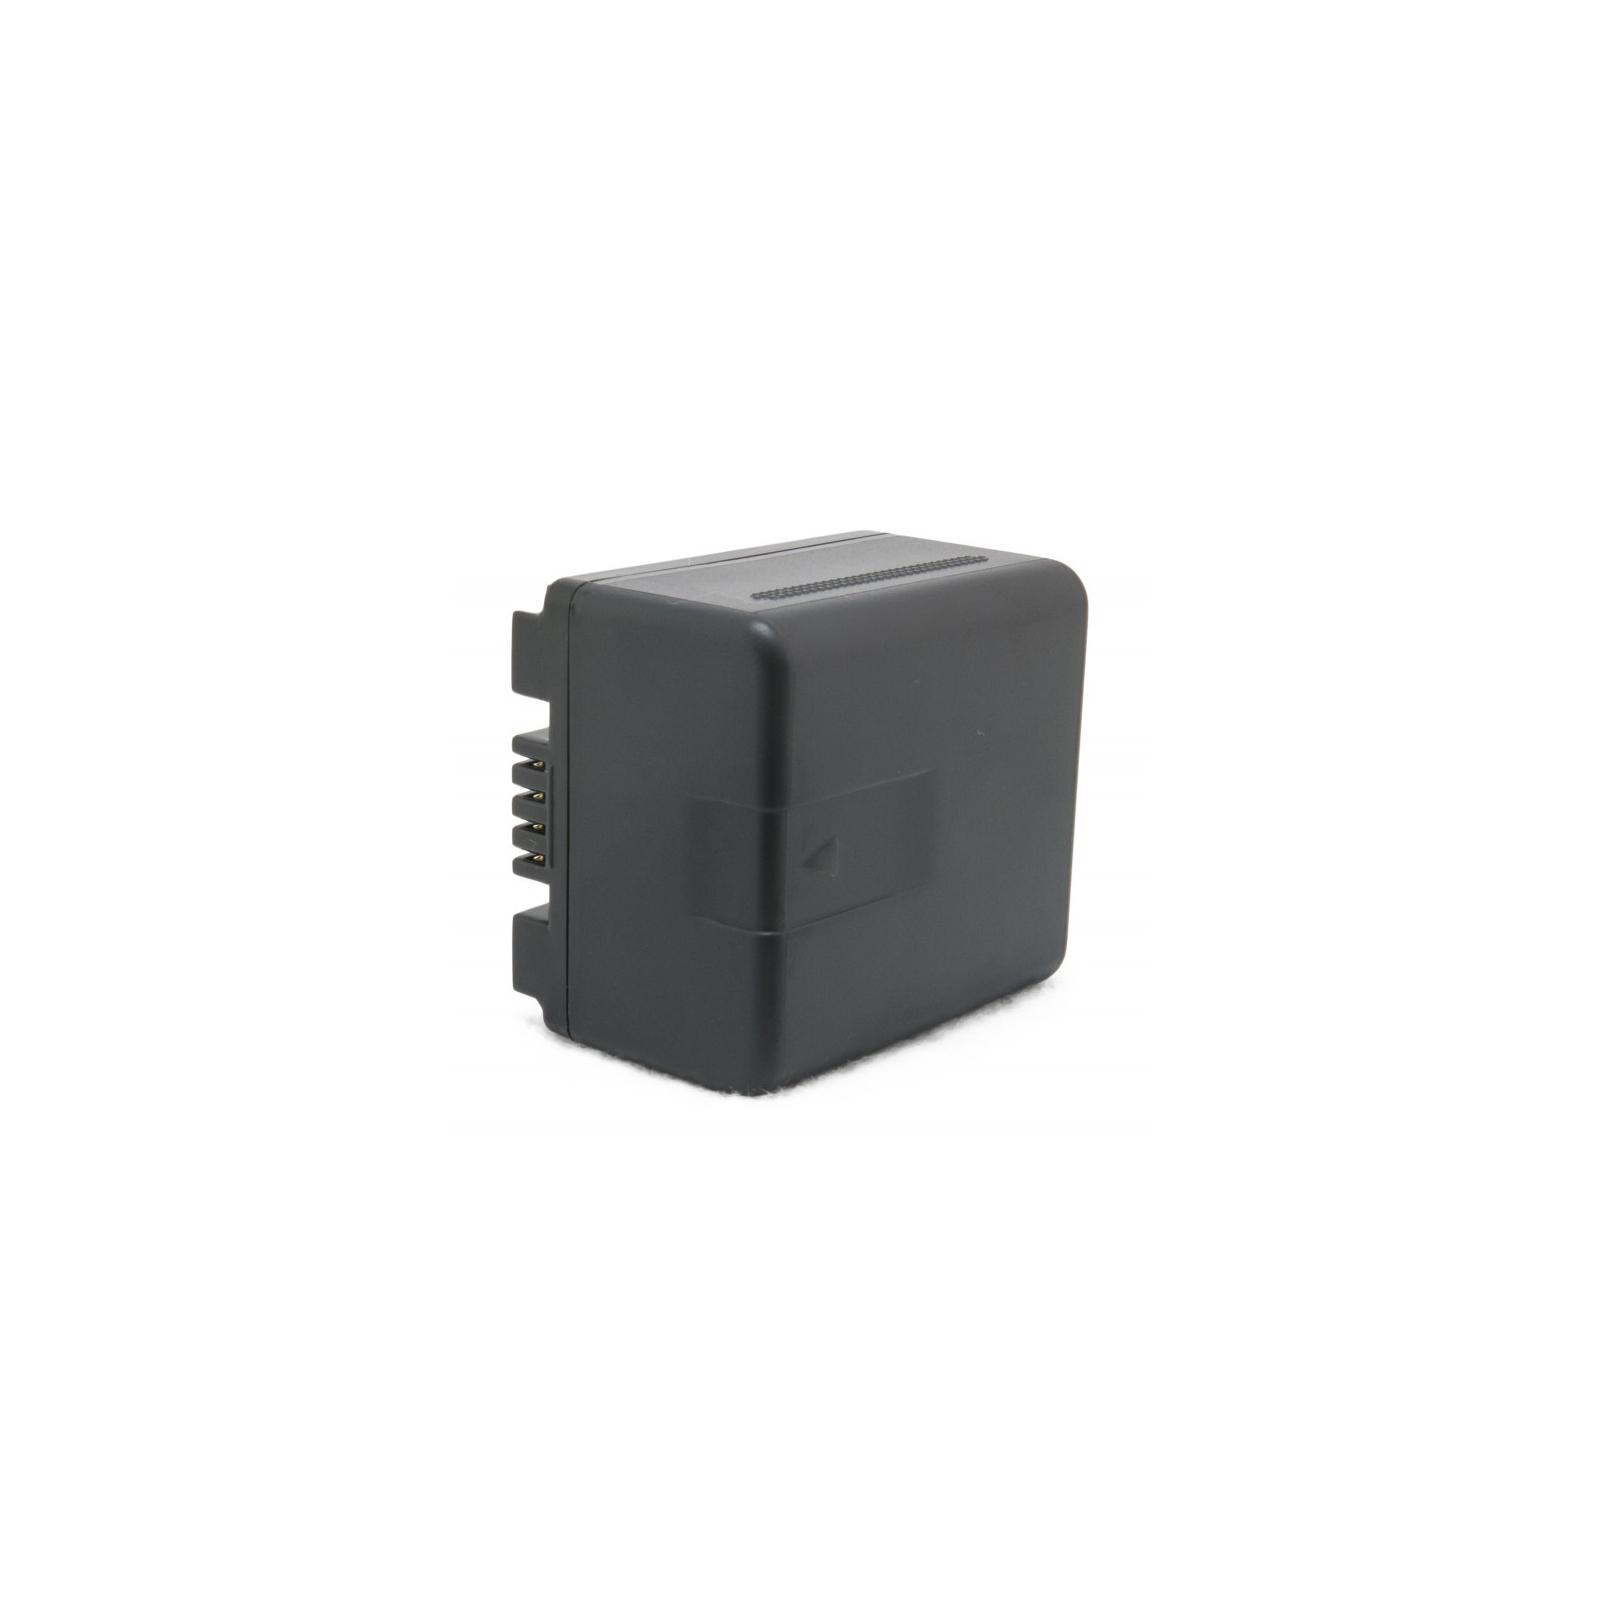 Аккумулятор к фото/видео EXTRADIGITAL Panasonic VW-VBN130 (DV00DV1361) изображение 3